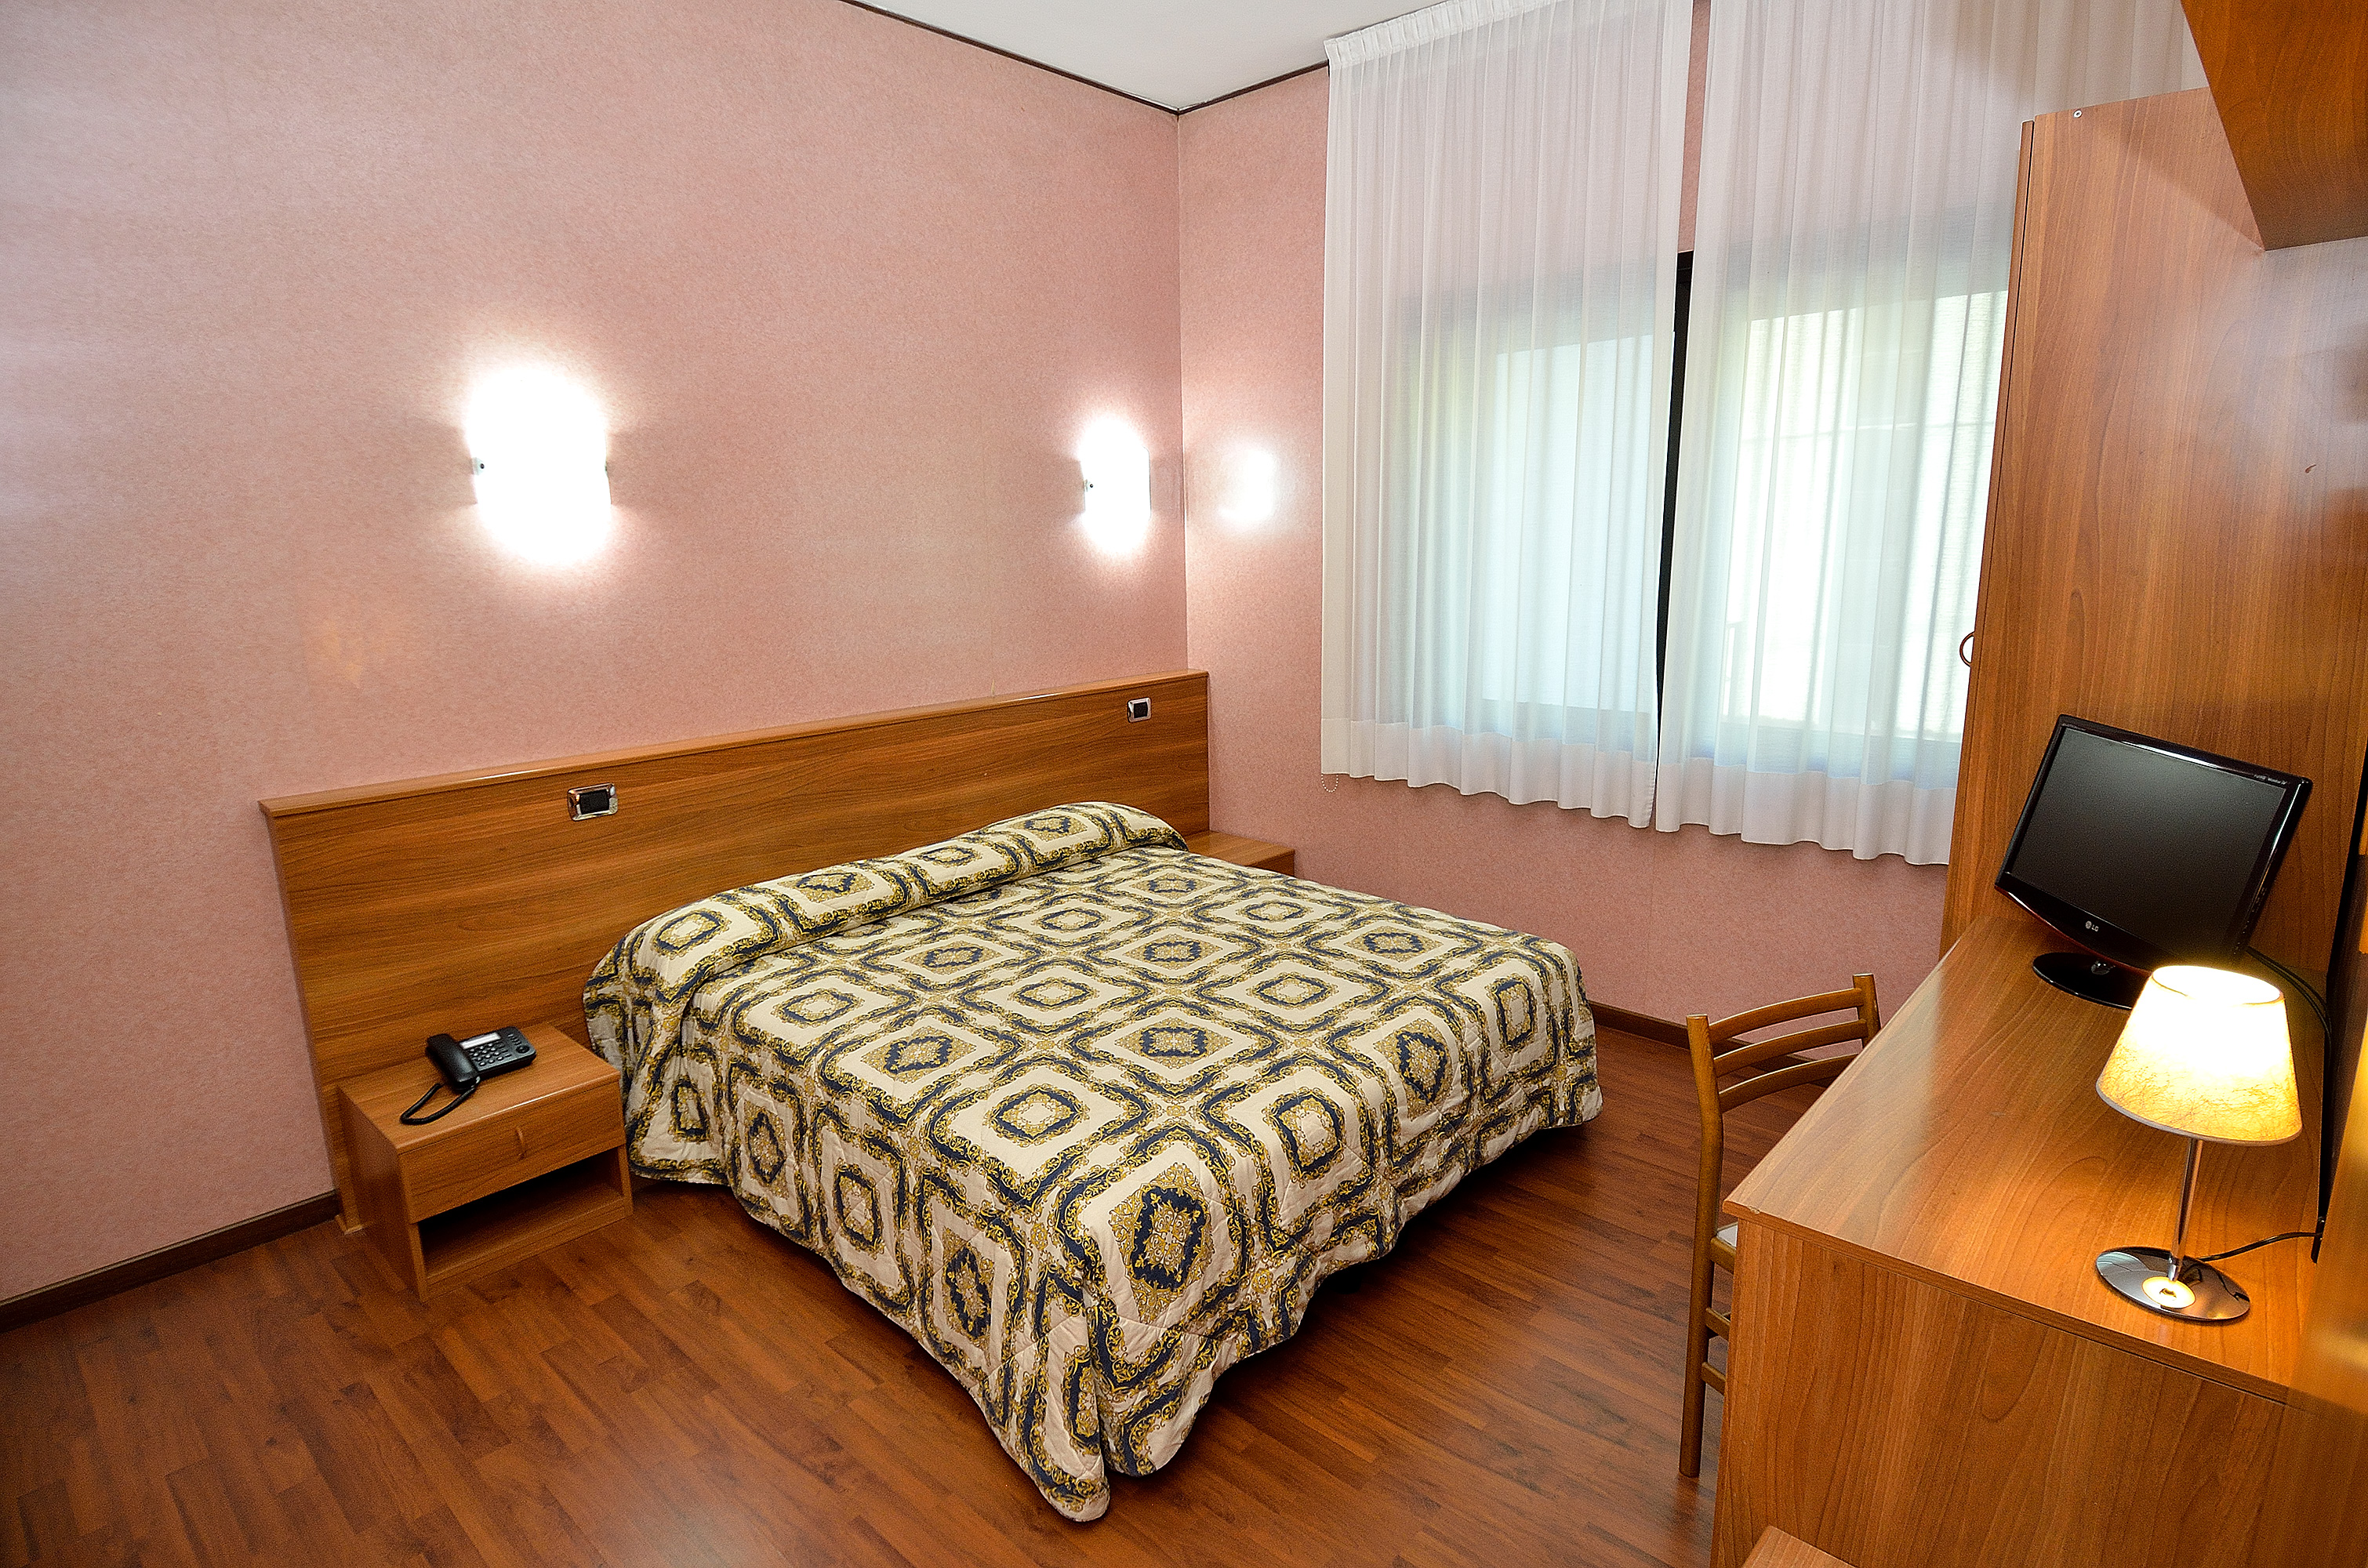 Hotel Nuova Mestre - Venice Italy - Official Site